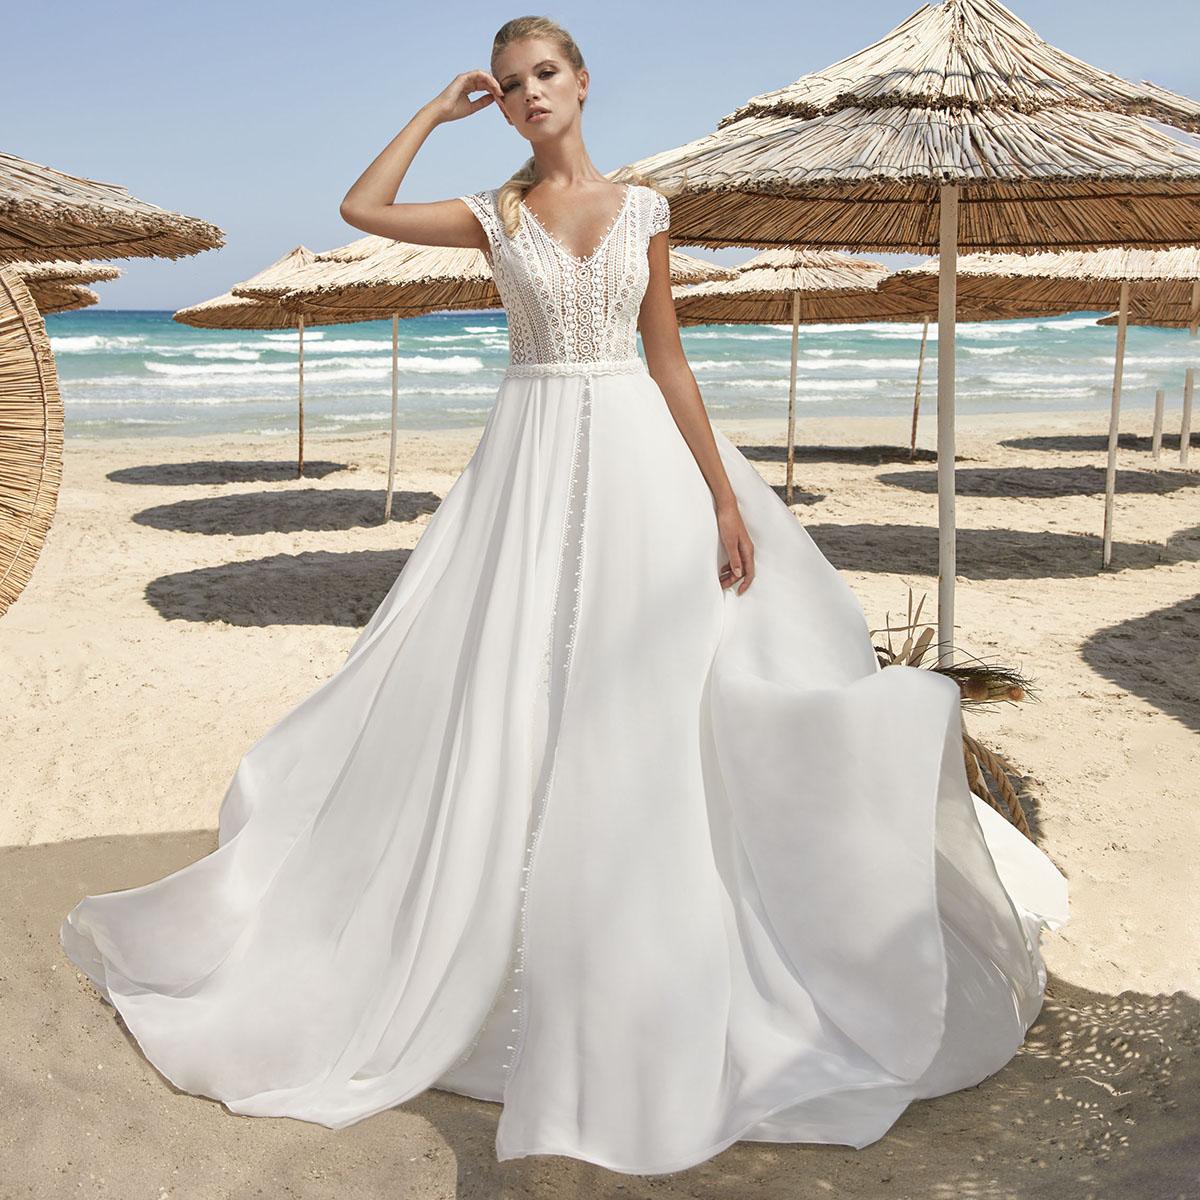 Promo Cap Sleeves V Neck Chiffon Boho Wedding Bride Dress 2021 Open Back Lace Beach Bridesmaid Bridal Gown Plus Size Free Shipping